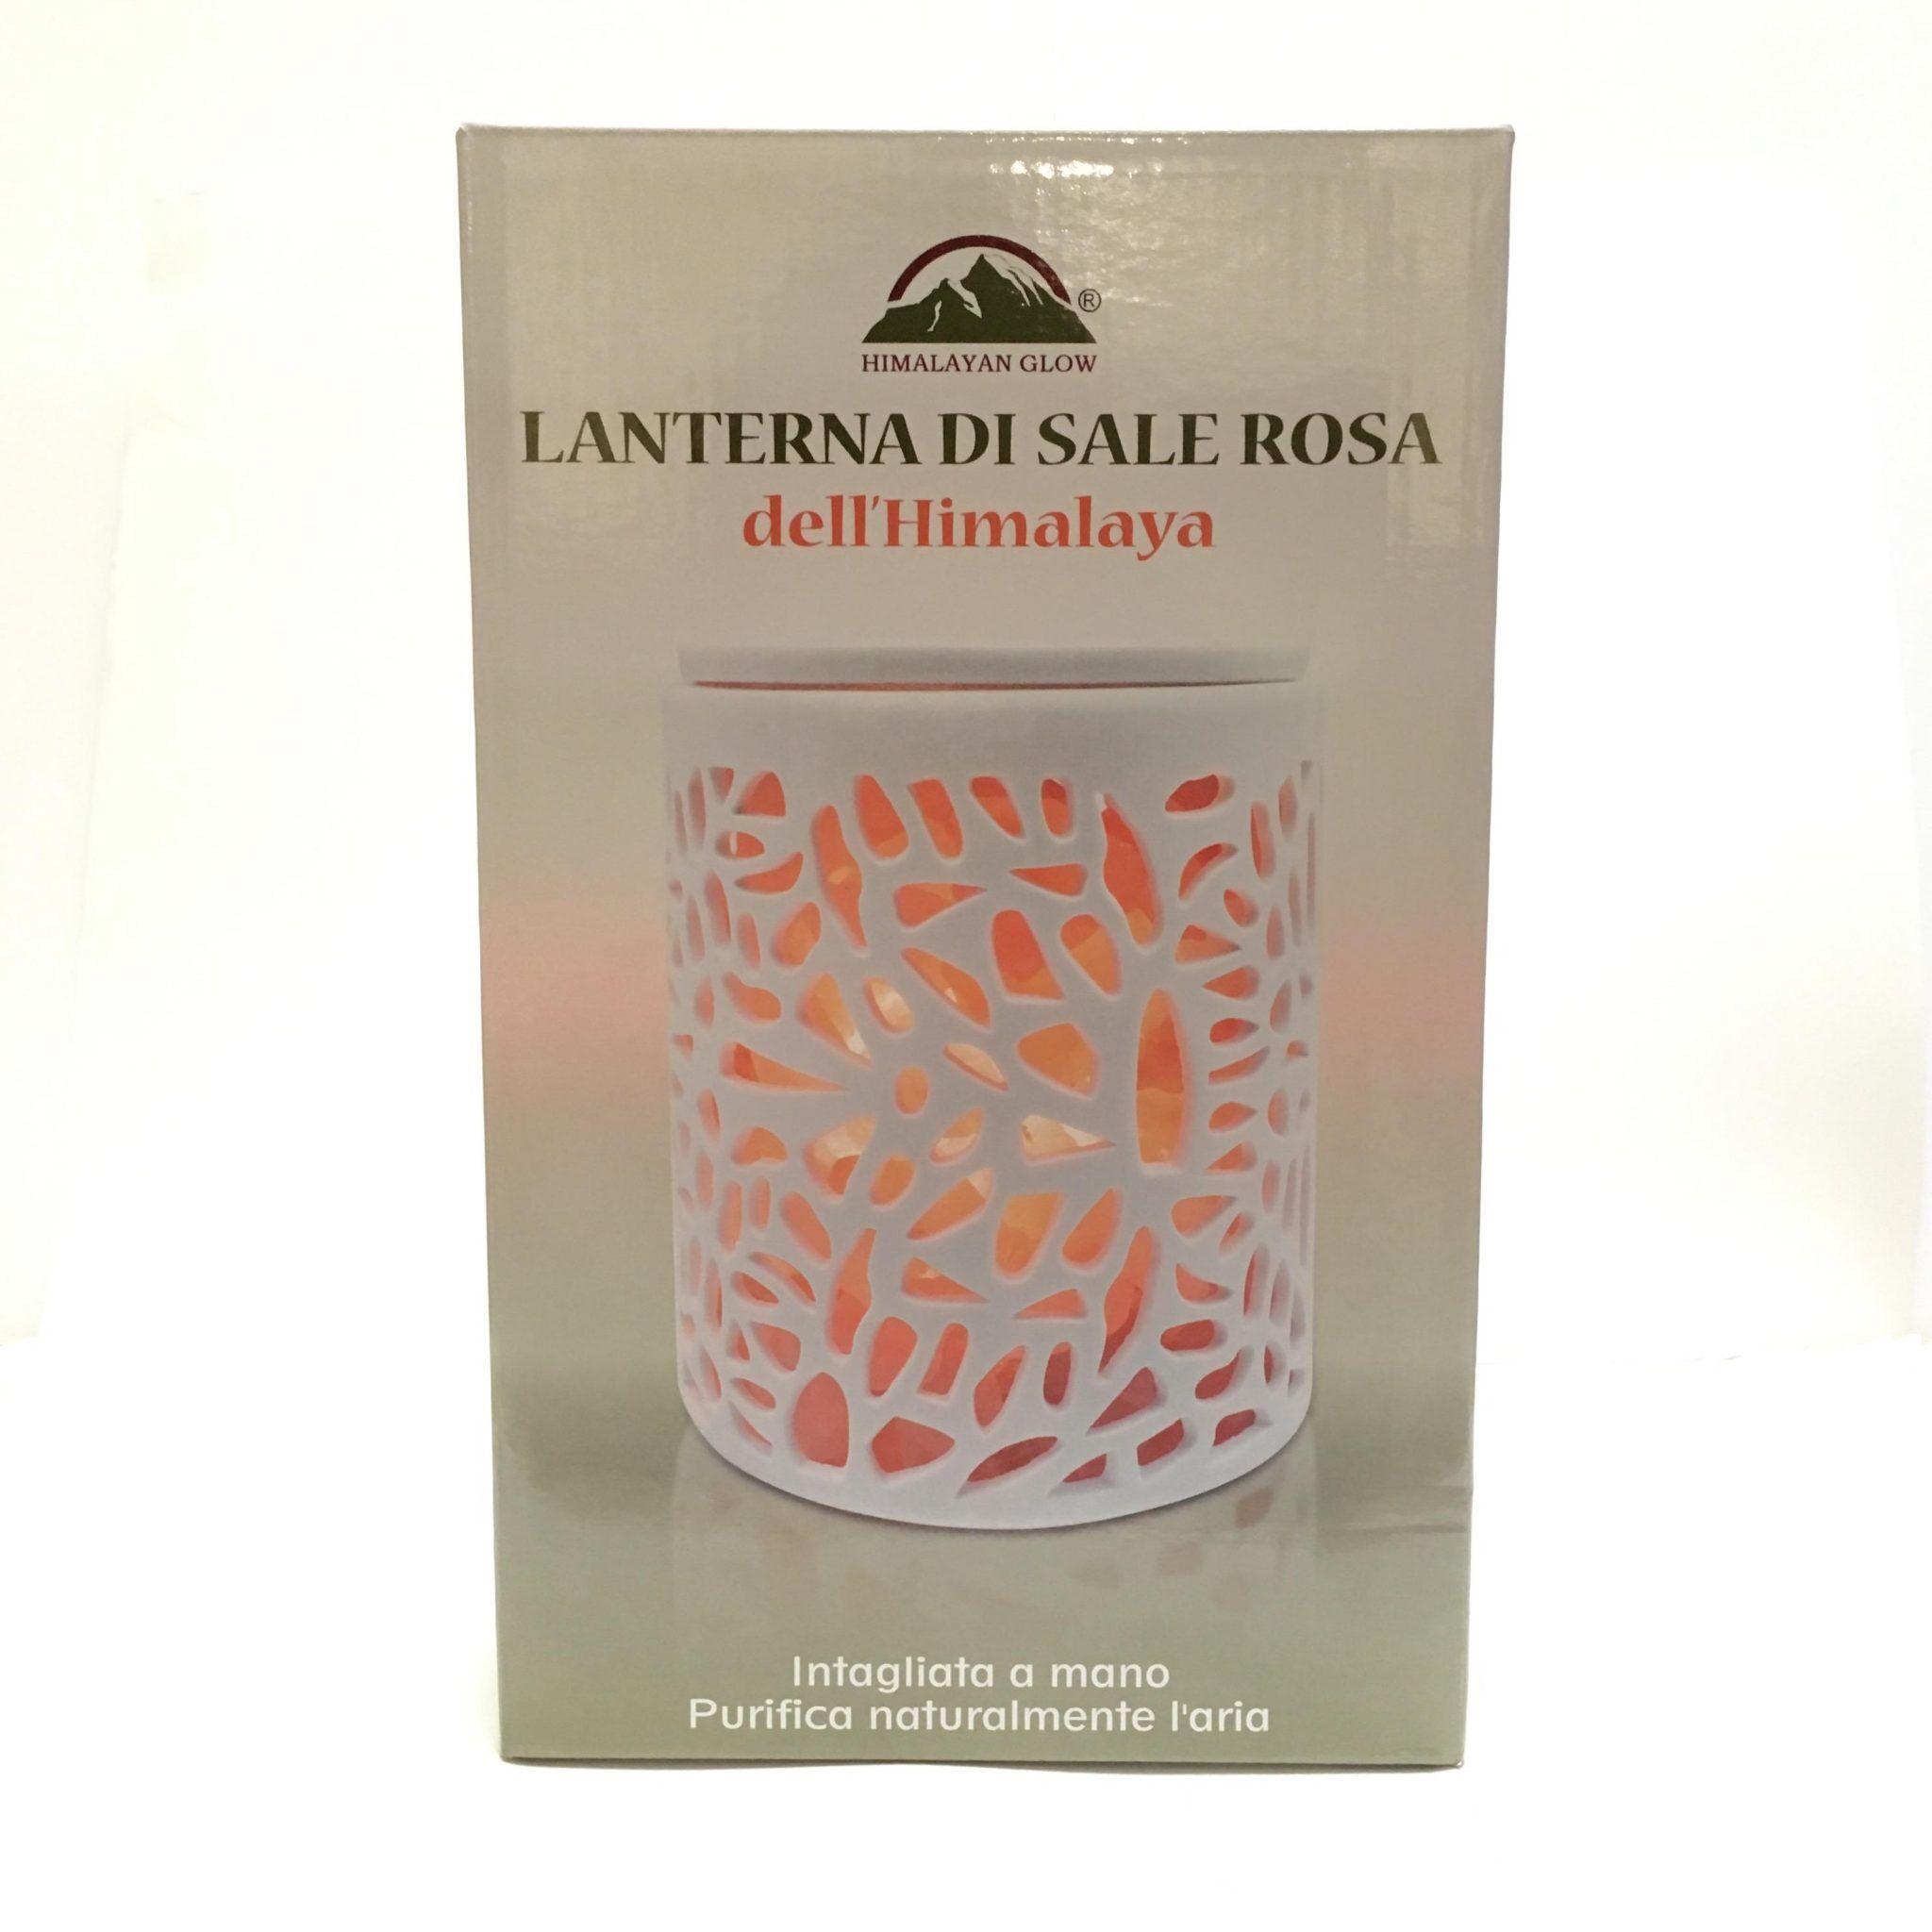 himalayan glow lanterna di sale rosa